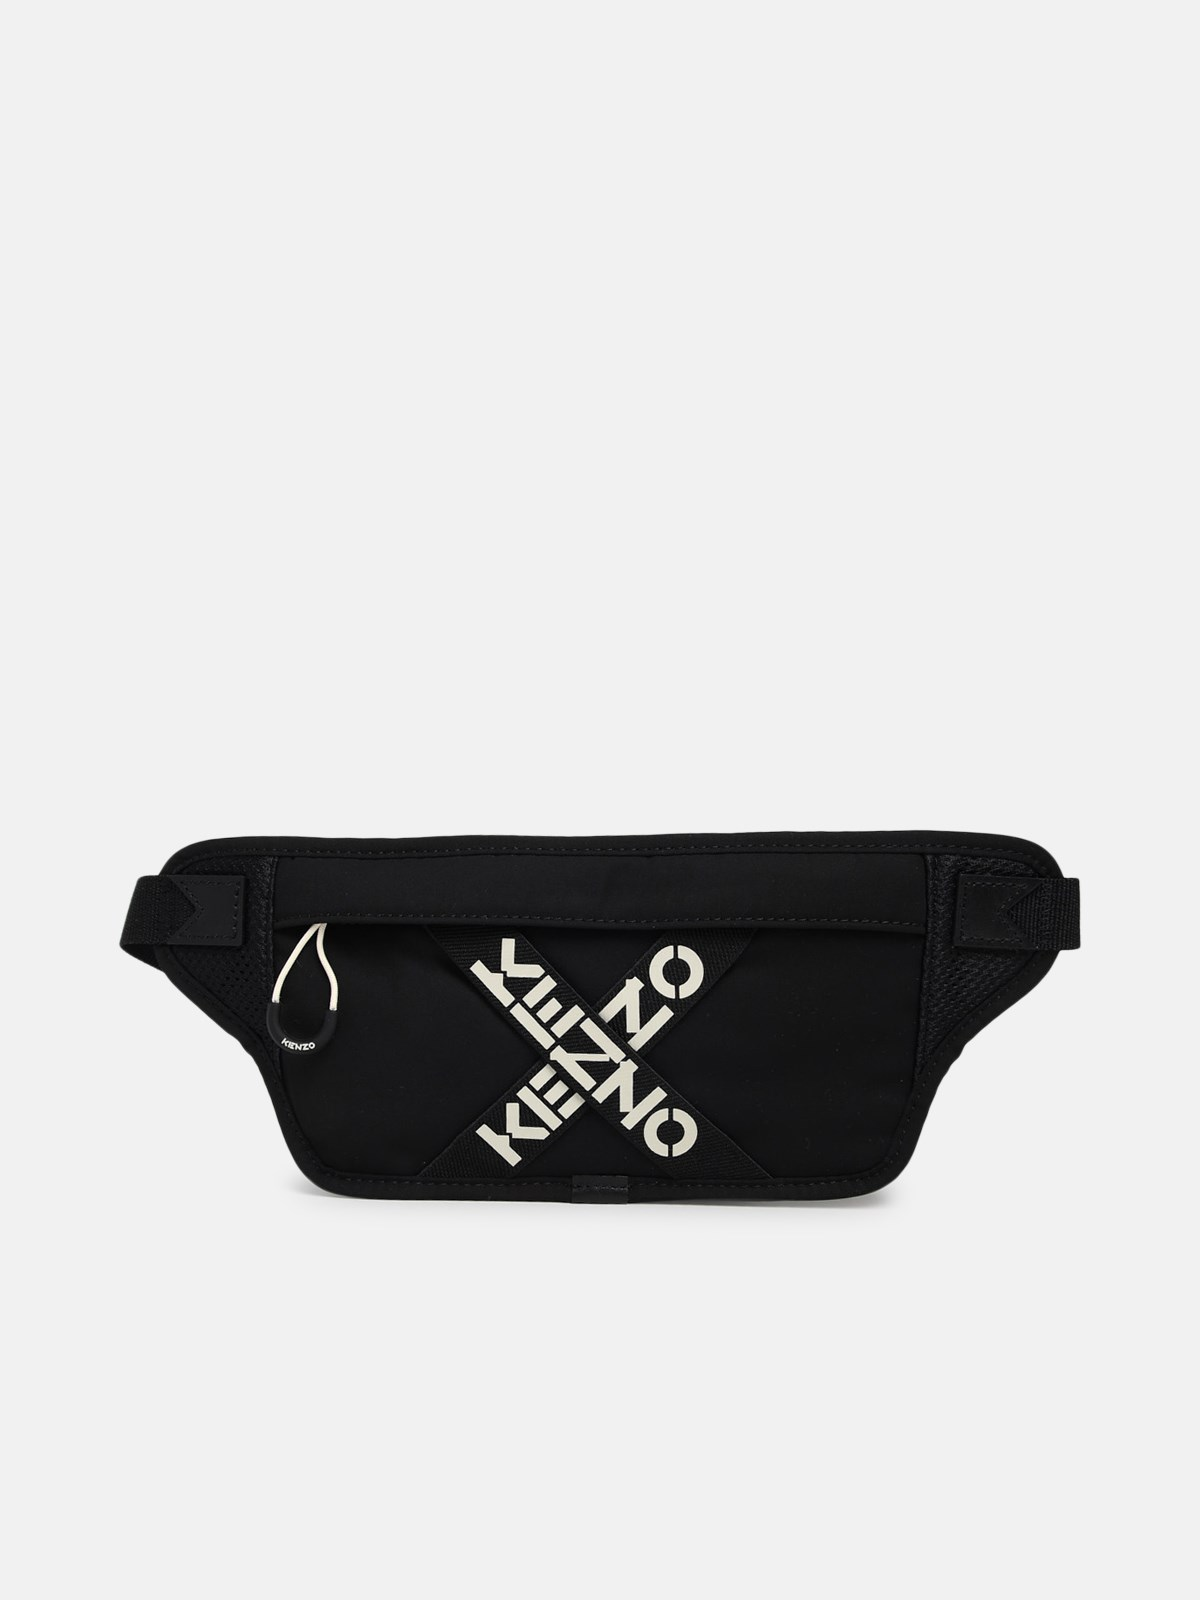 Kenzo Bags BLACK FANNY PACK